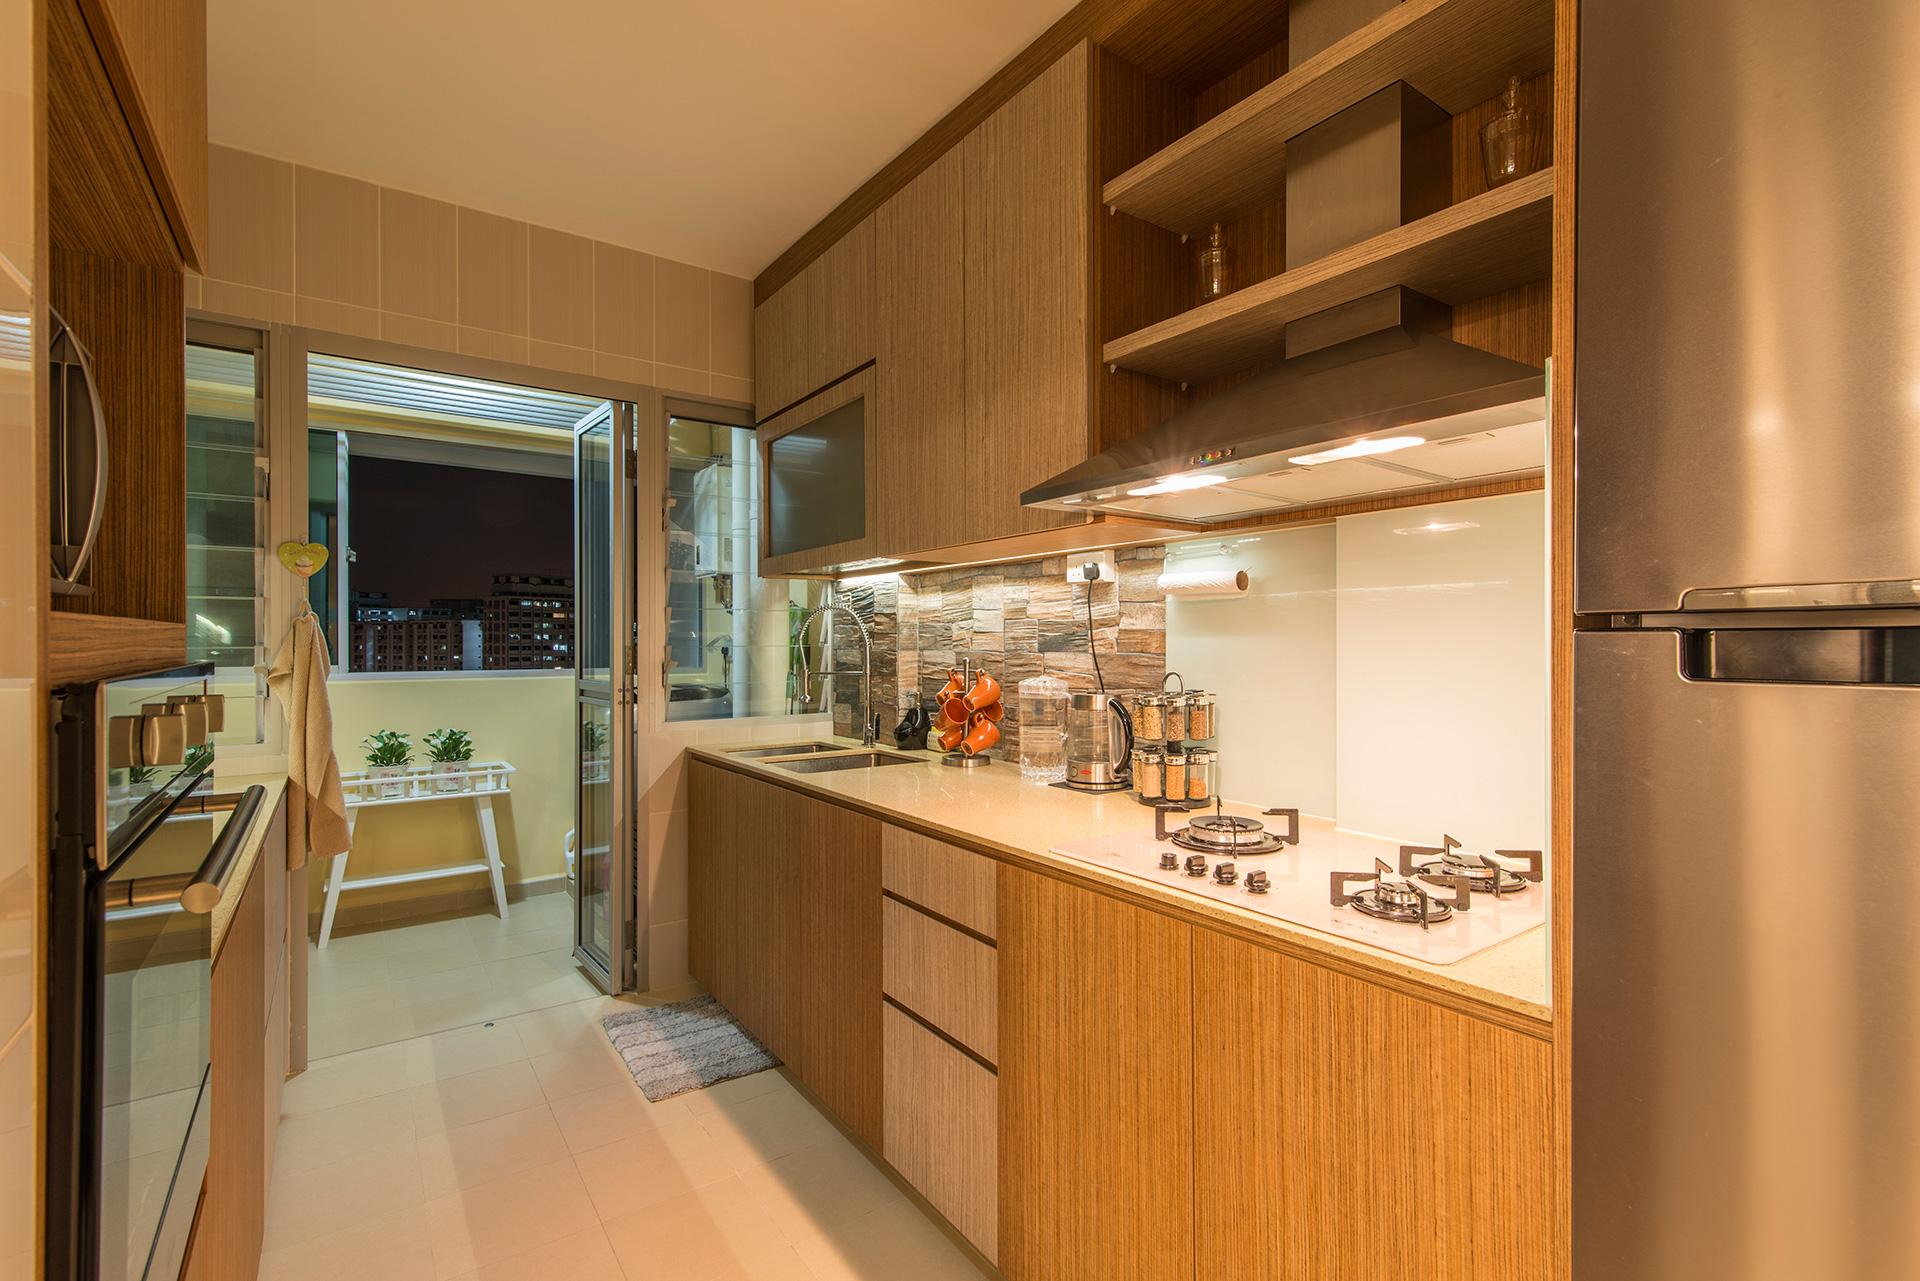 Country, Rustic Design - Kitchen - HDB 5 Room - Design by Ideal Design Interior Pte Ltd